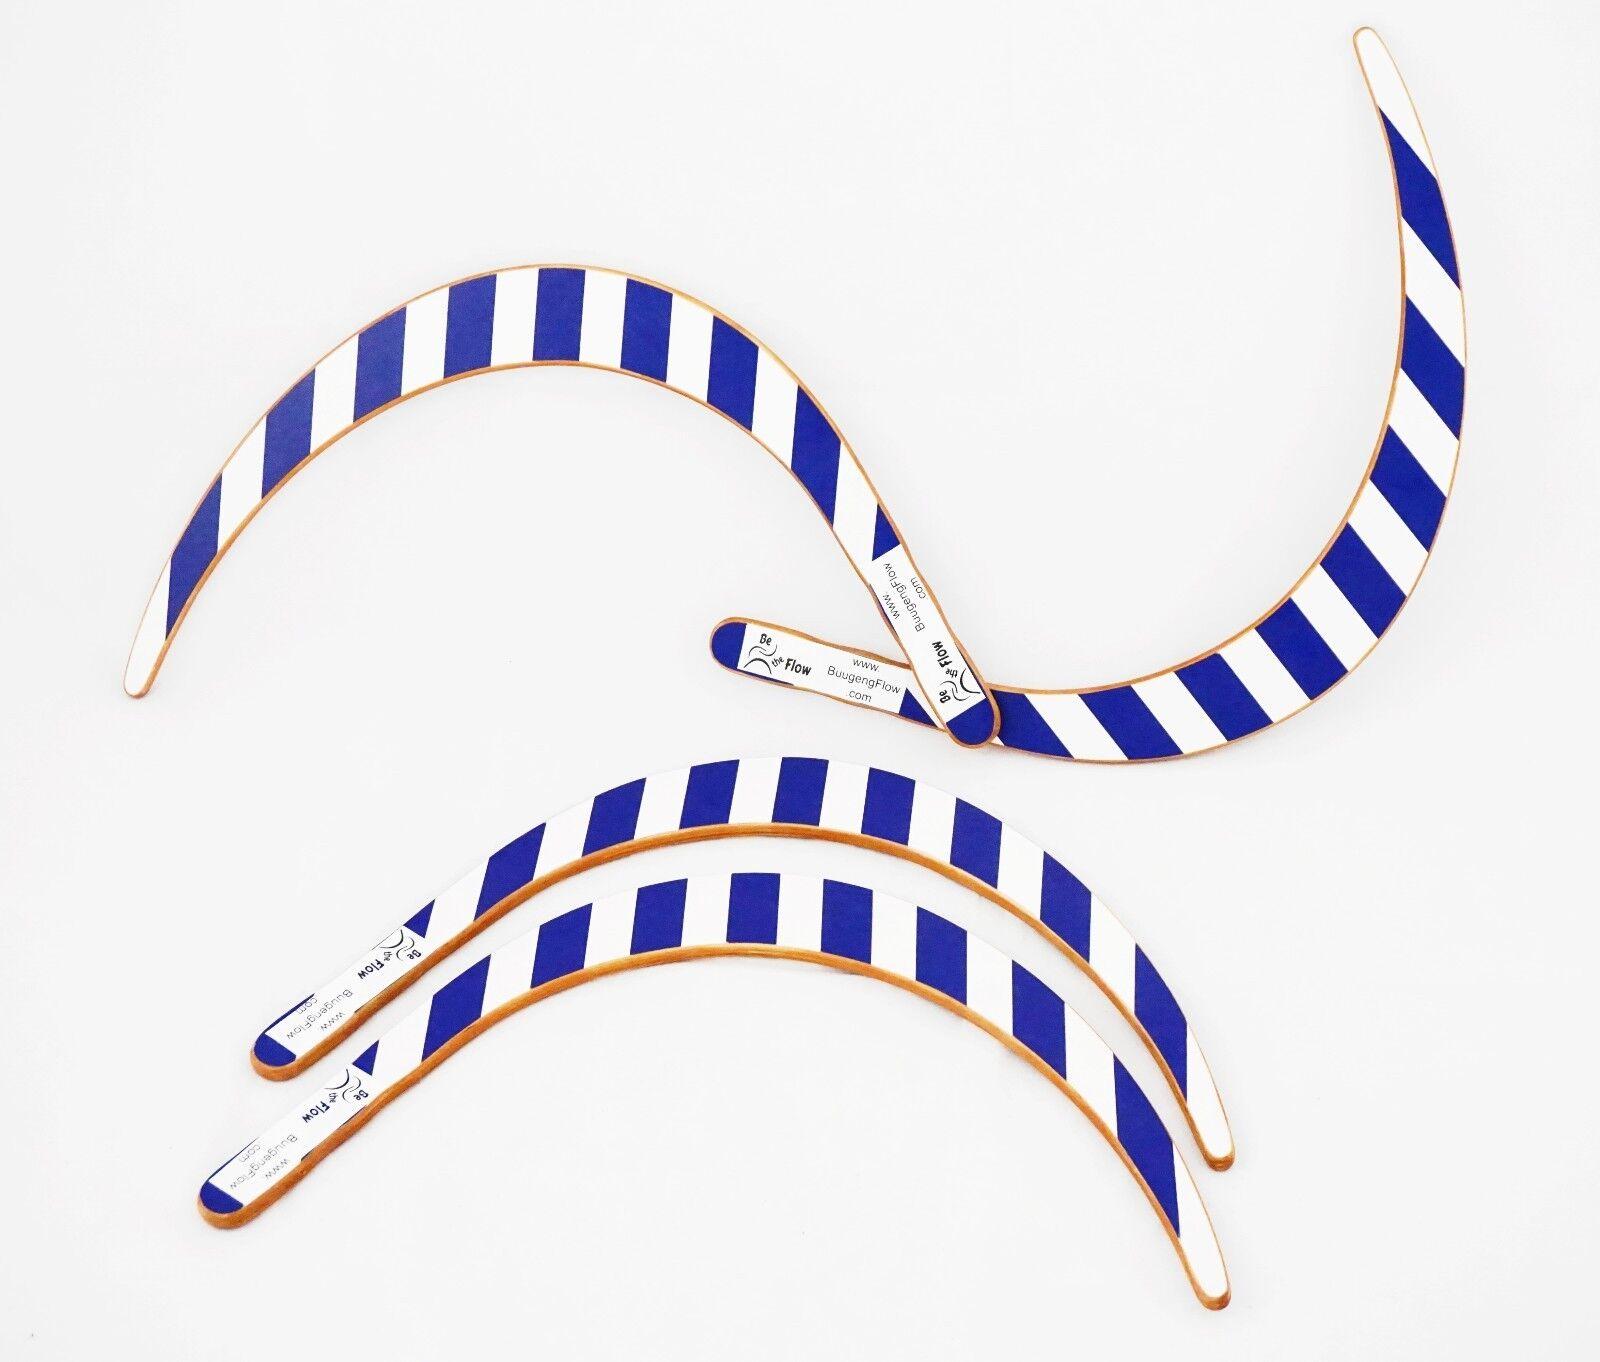 Buugeng Flow S Staff Diamond Edition 2 colors (White& purple bluee) + Free Bag